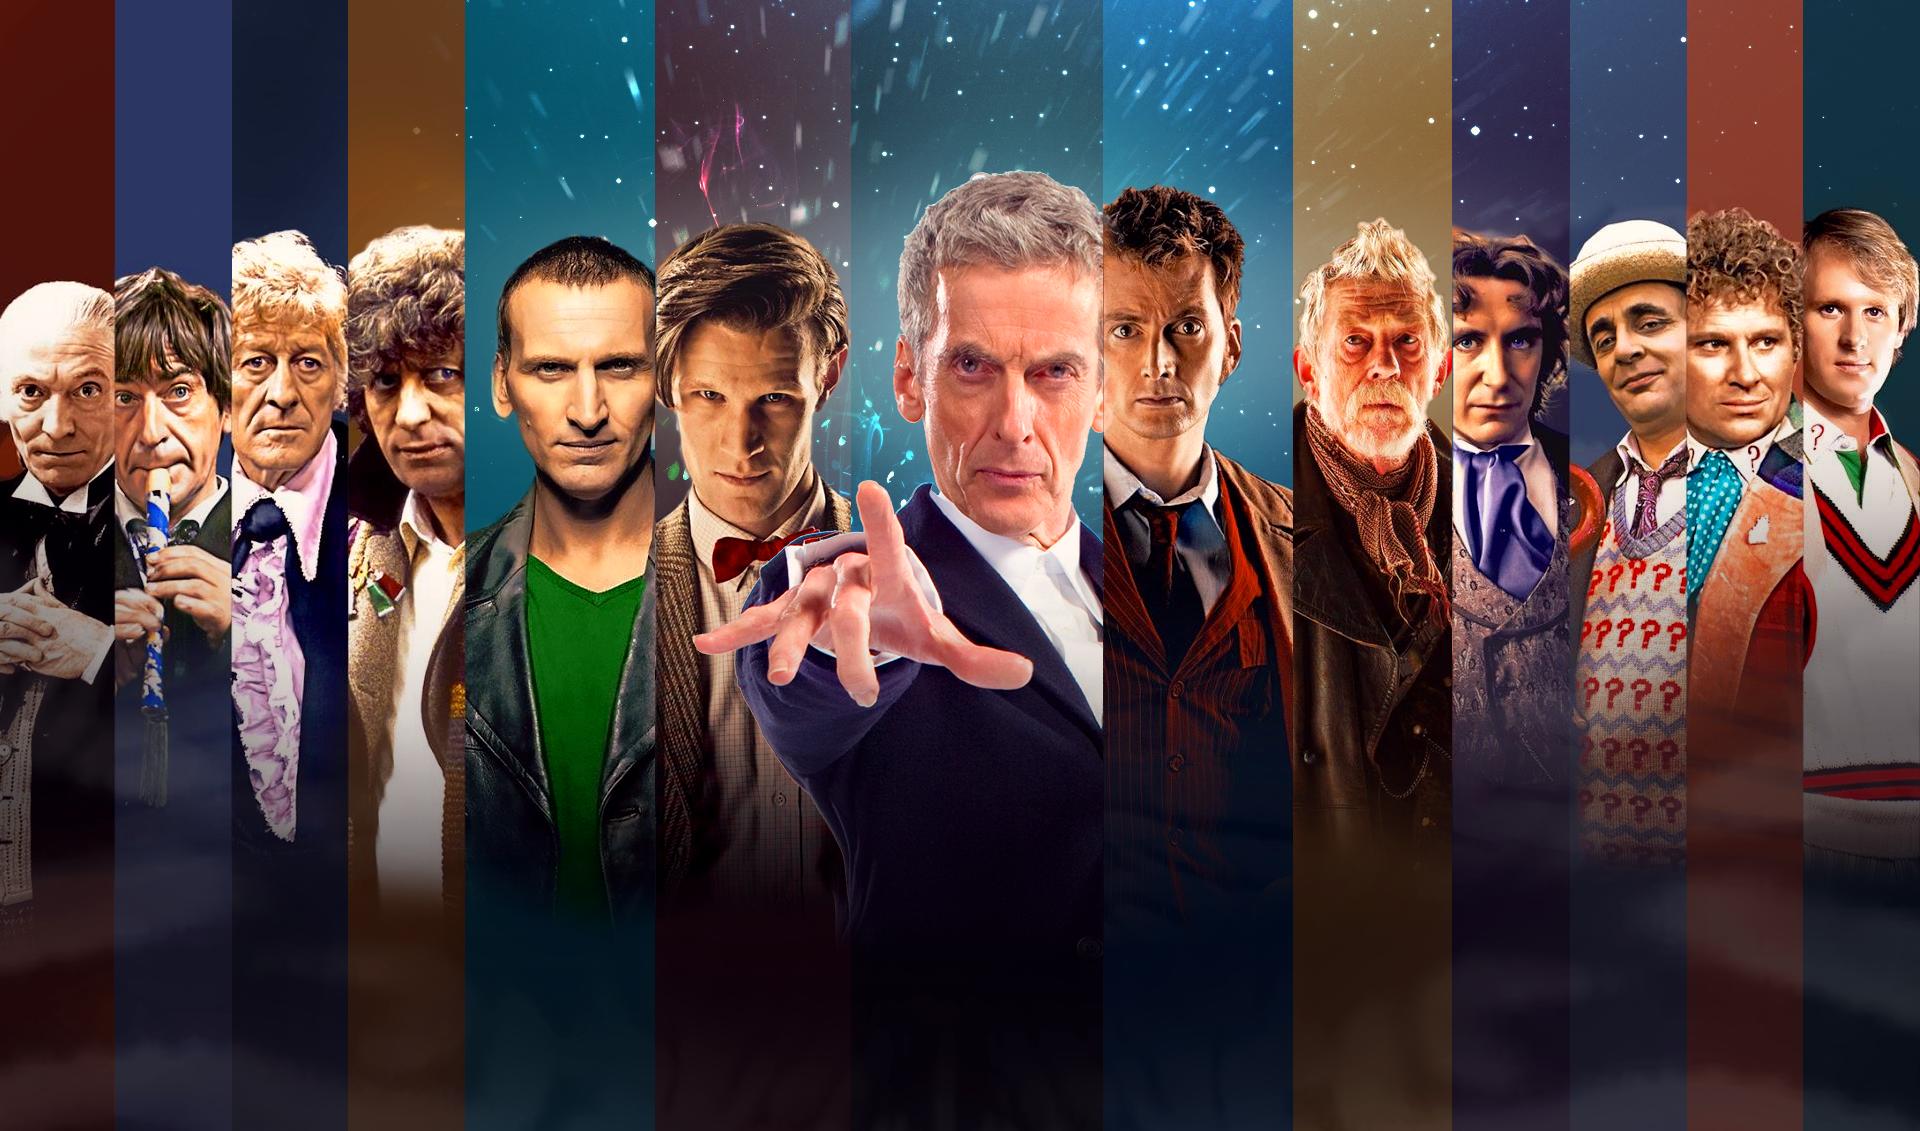 General 1920x1131 Doctor Who The Doctor Christopher Eccleston David Tennant Matt Smith Peter Capaldi Tom Baker John Hurt panels Science Fiction Men science fiction